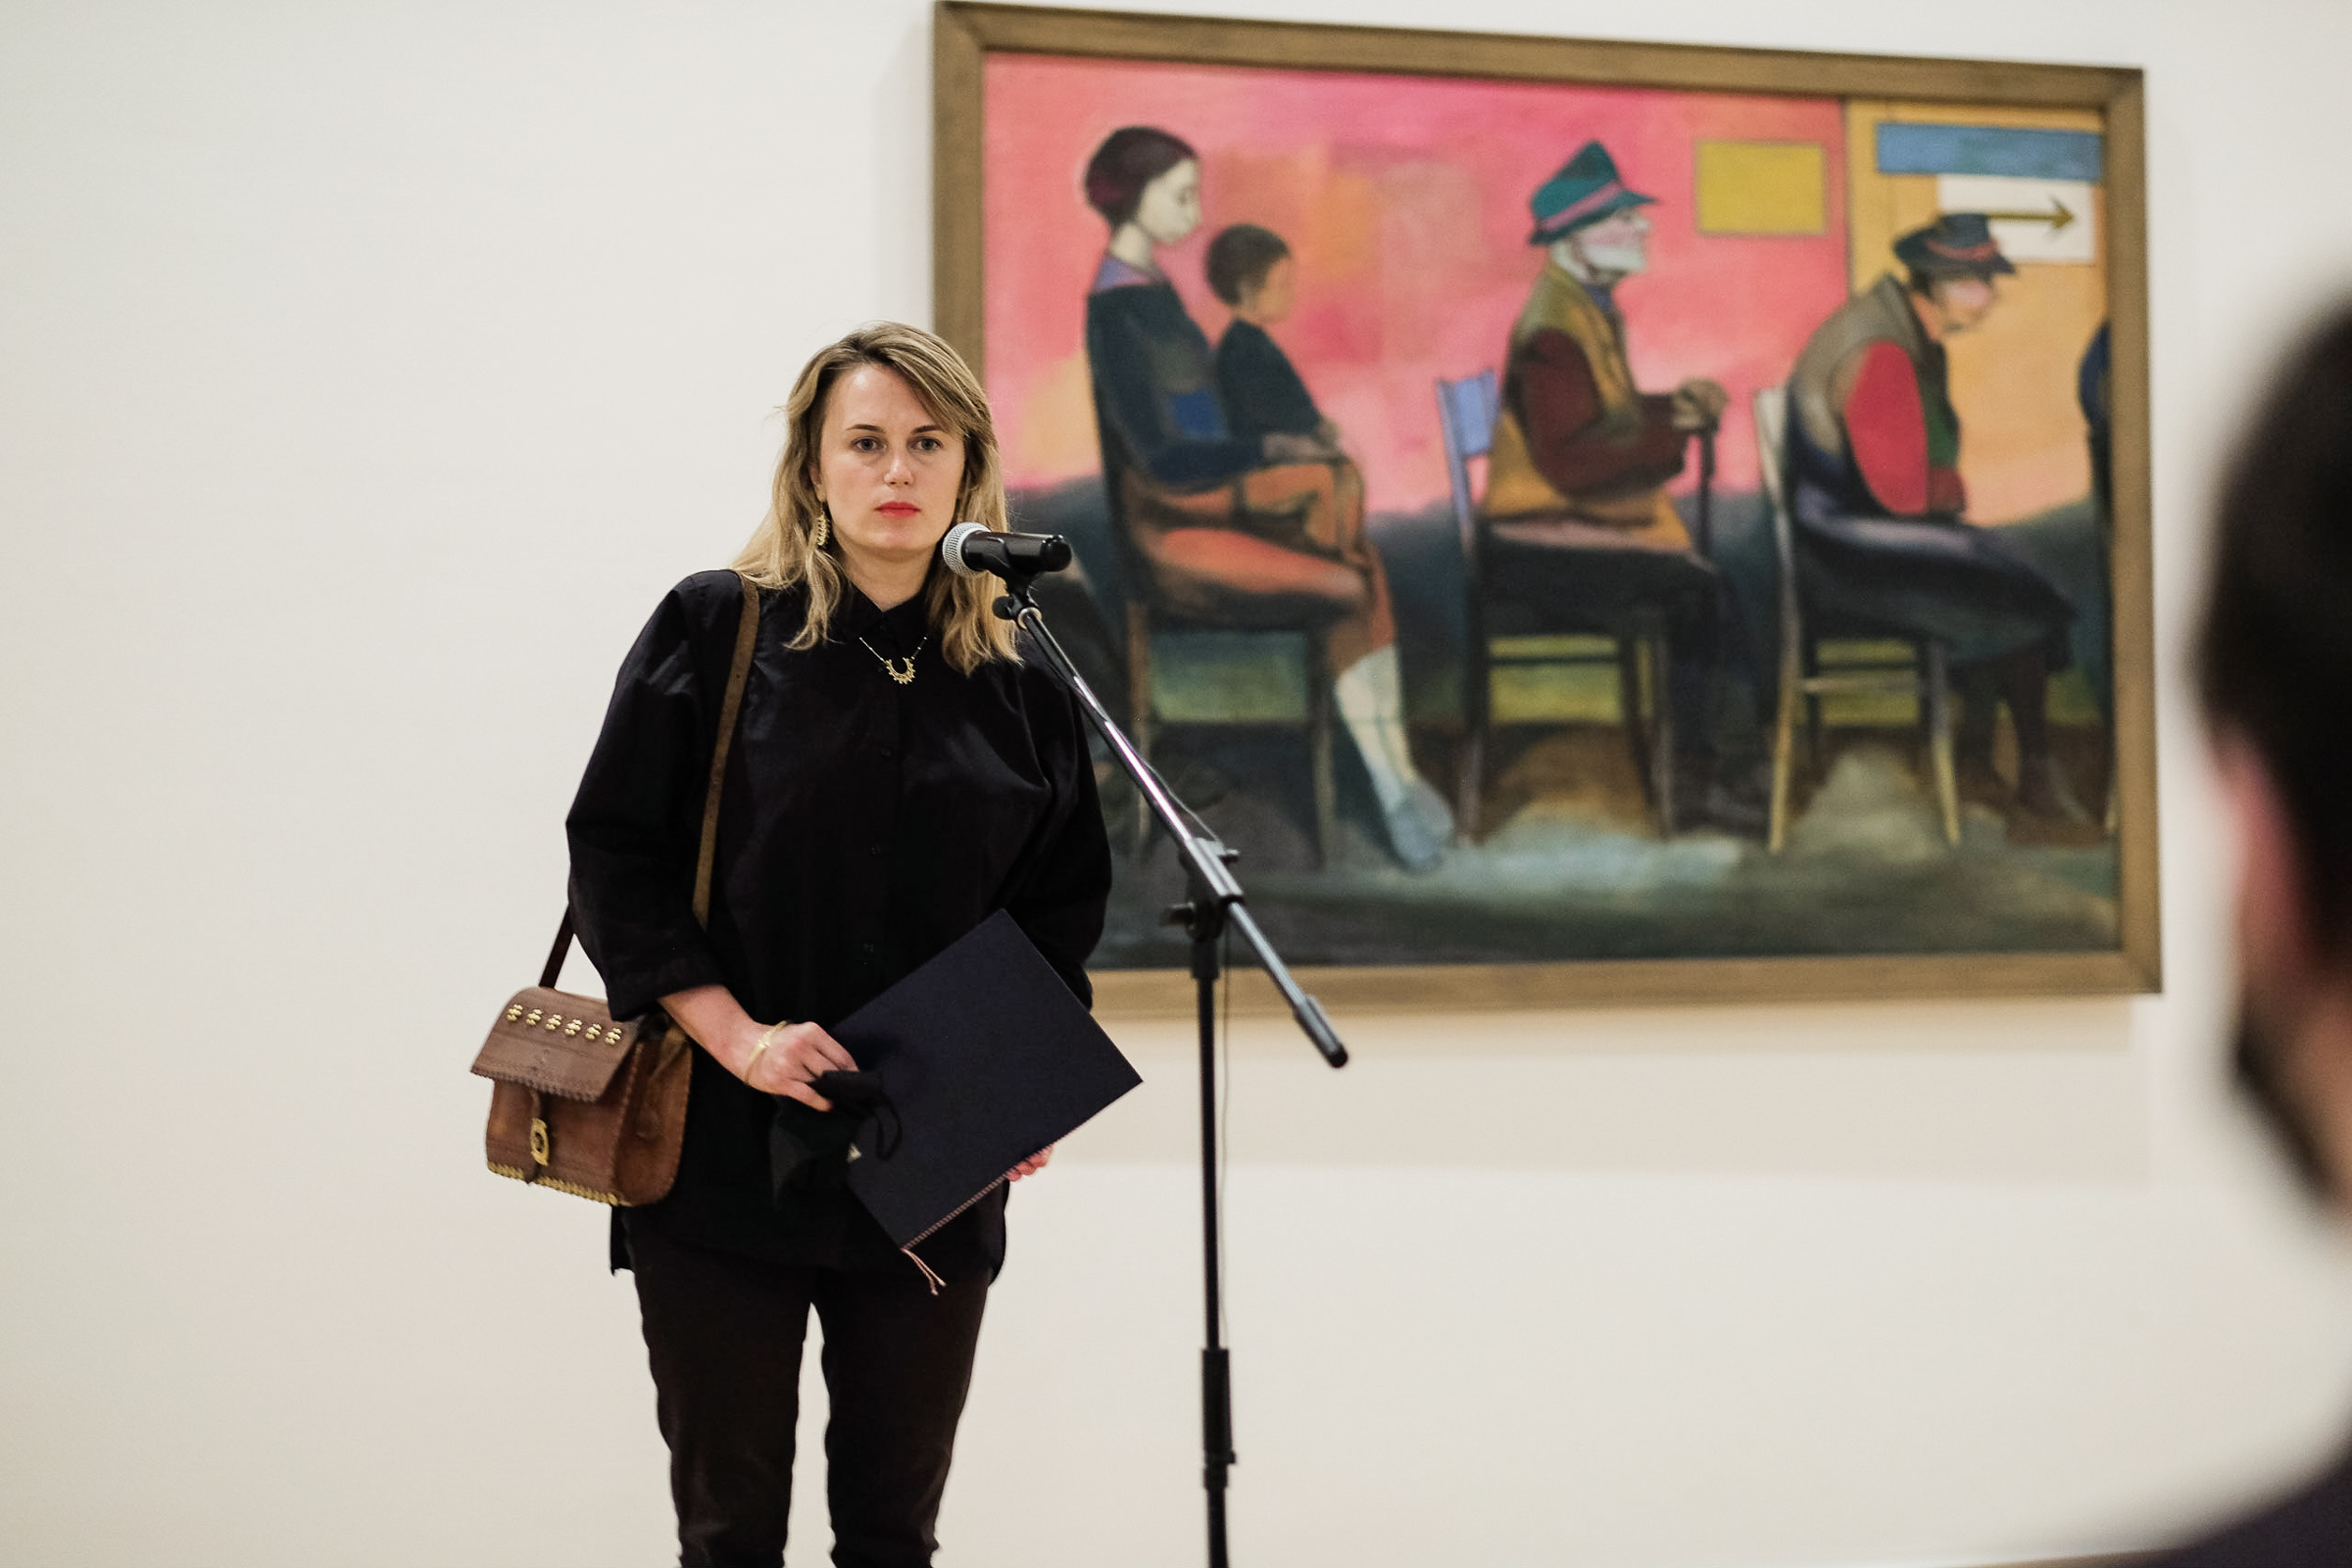 Monika Grochowska, deputy director of Adam Mickiewicz Institute